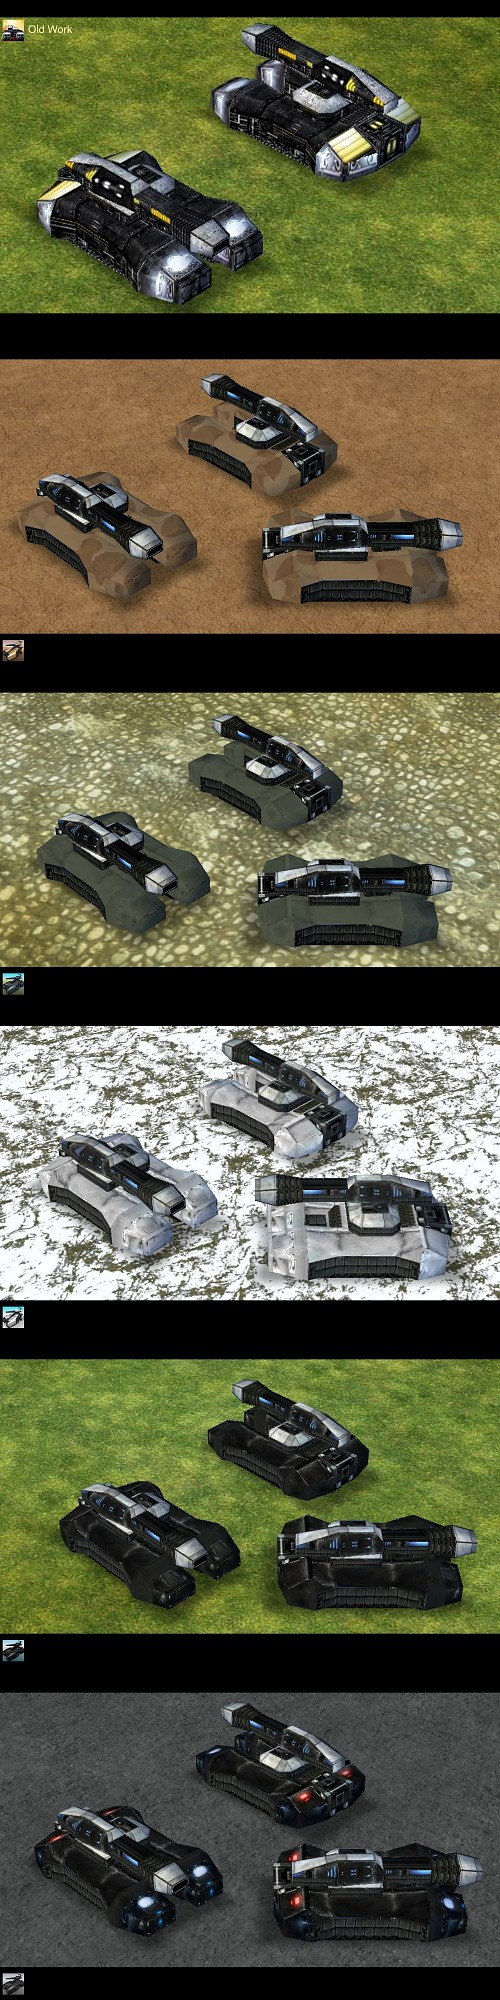 New Skins for Gladiator Tank